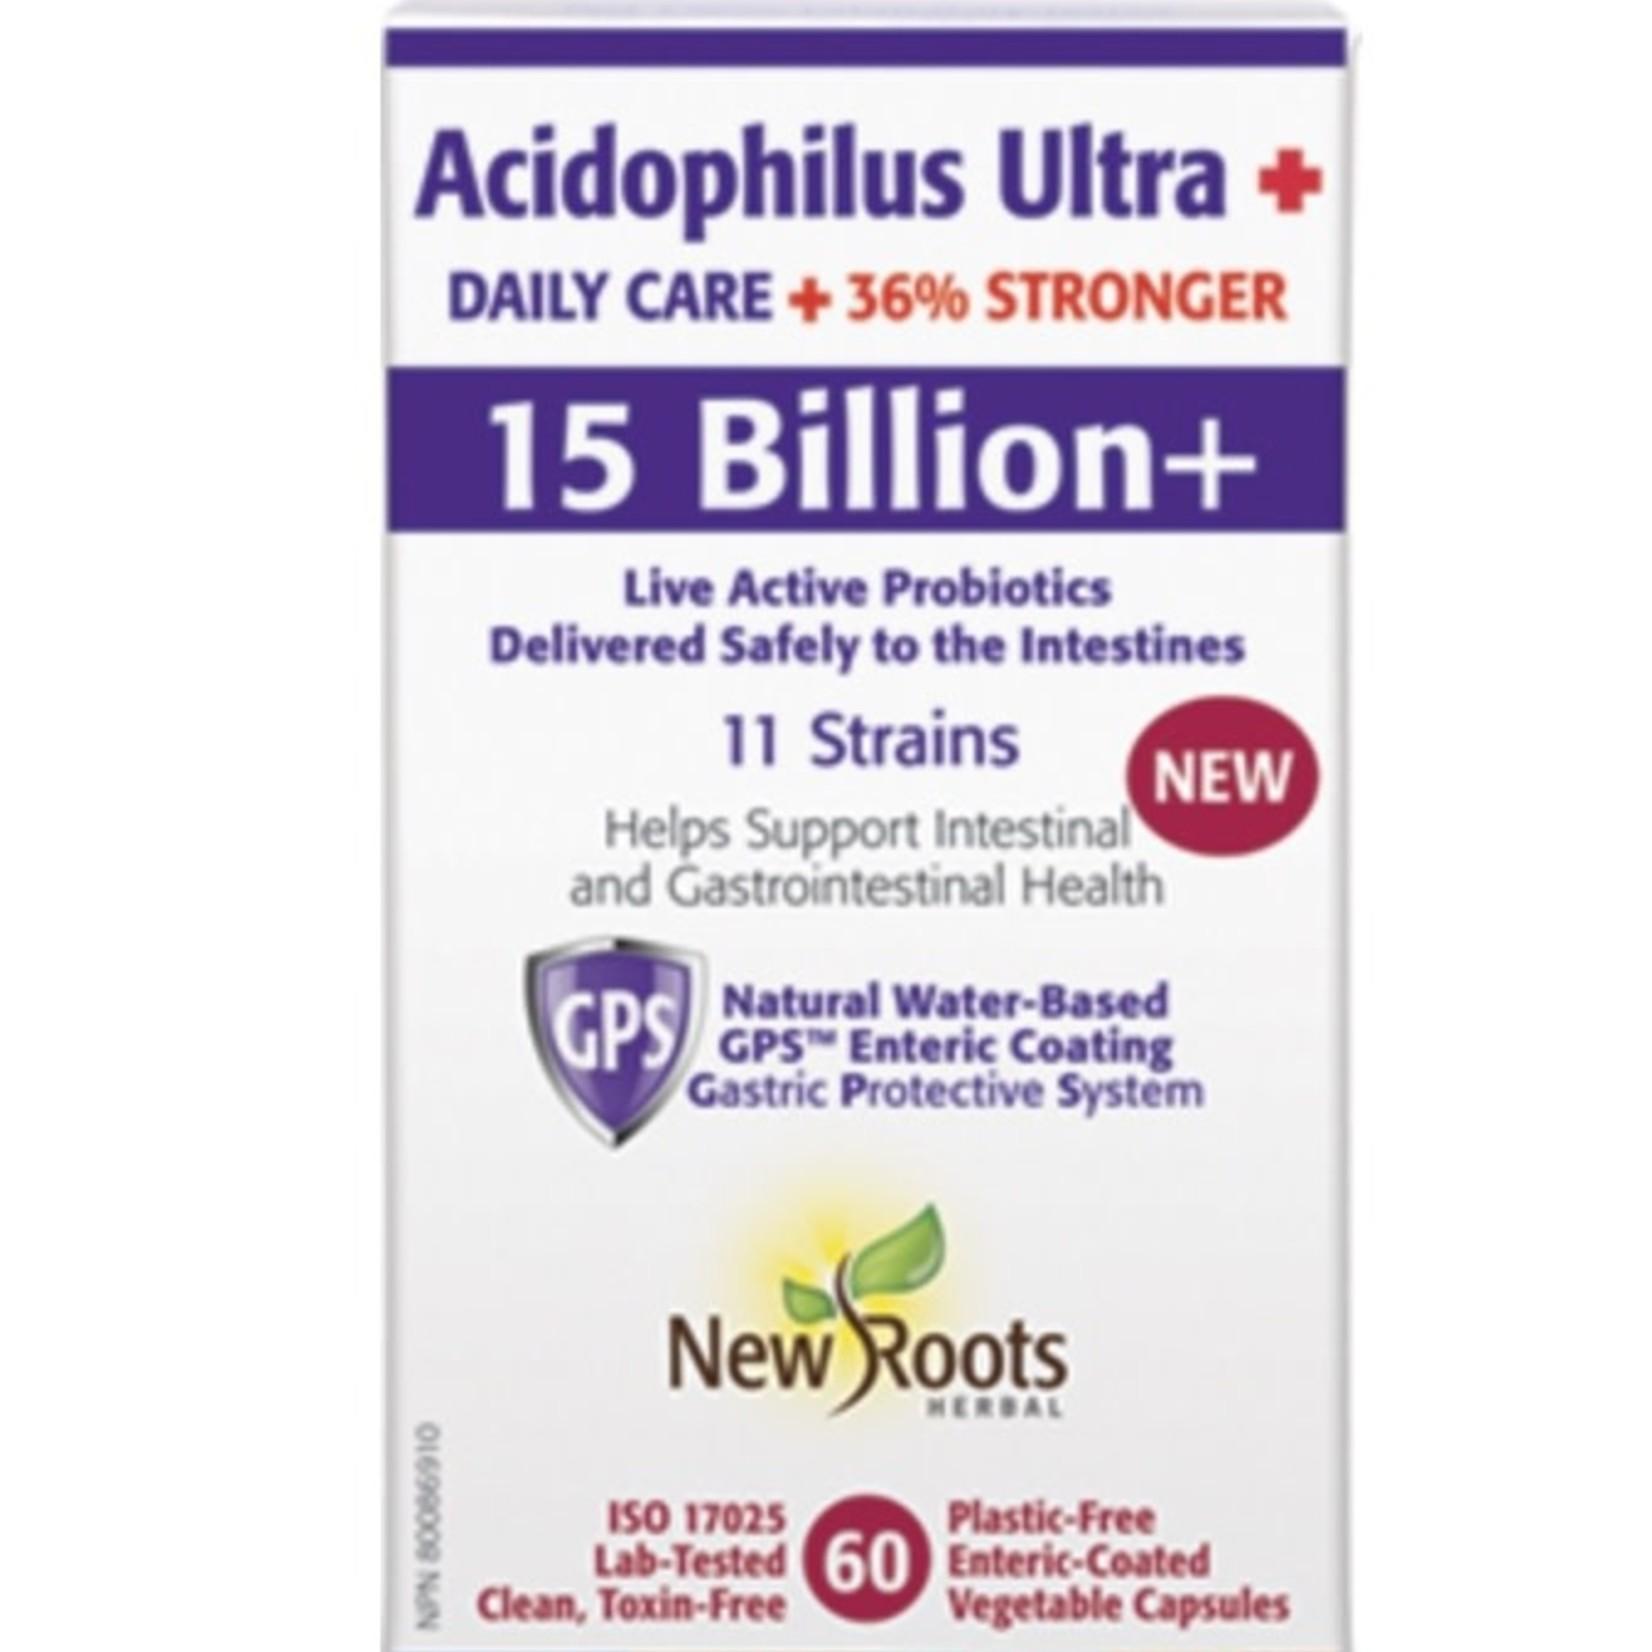 New Roots New Roots Acidophilus Ultra 15 billion 60 caps